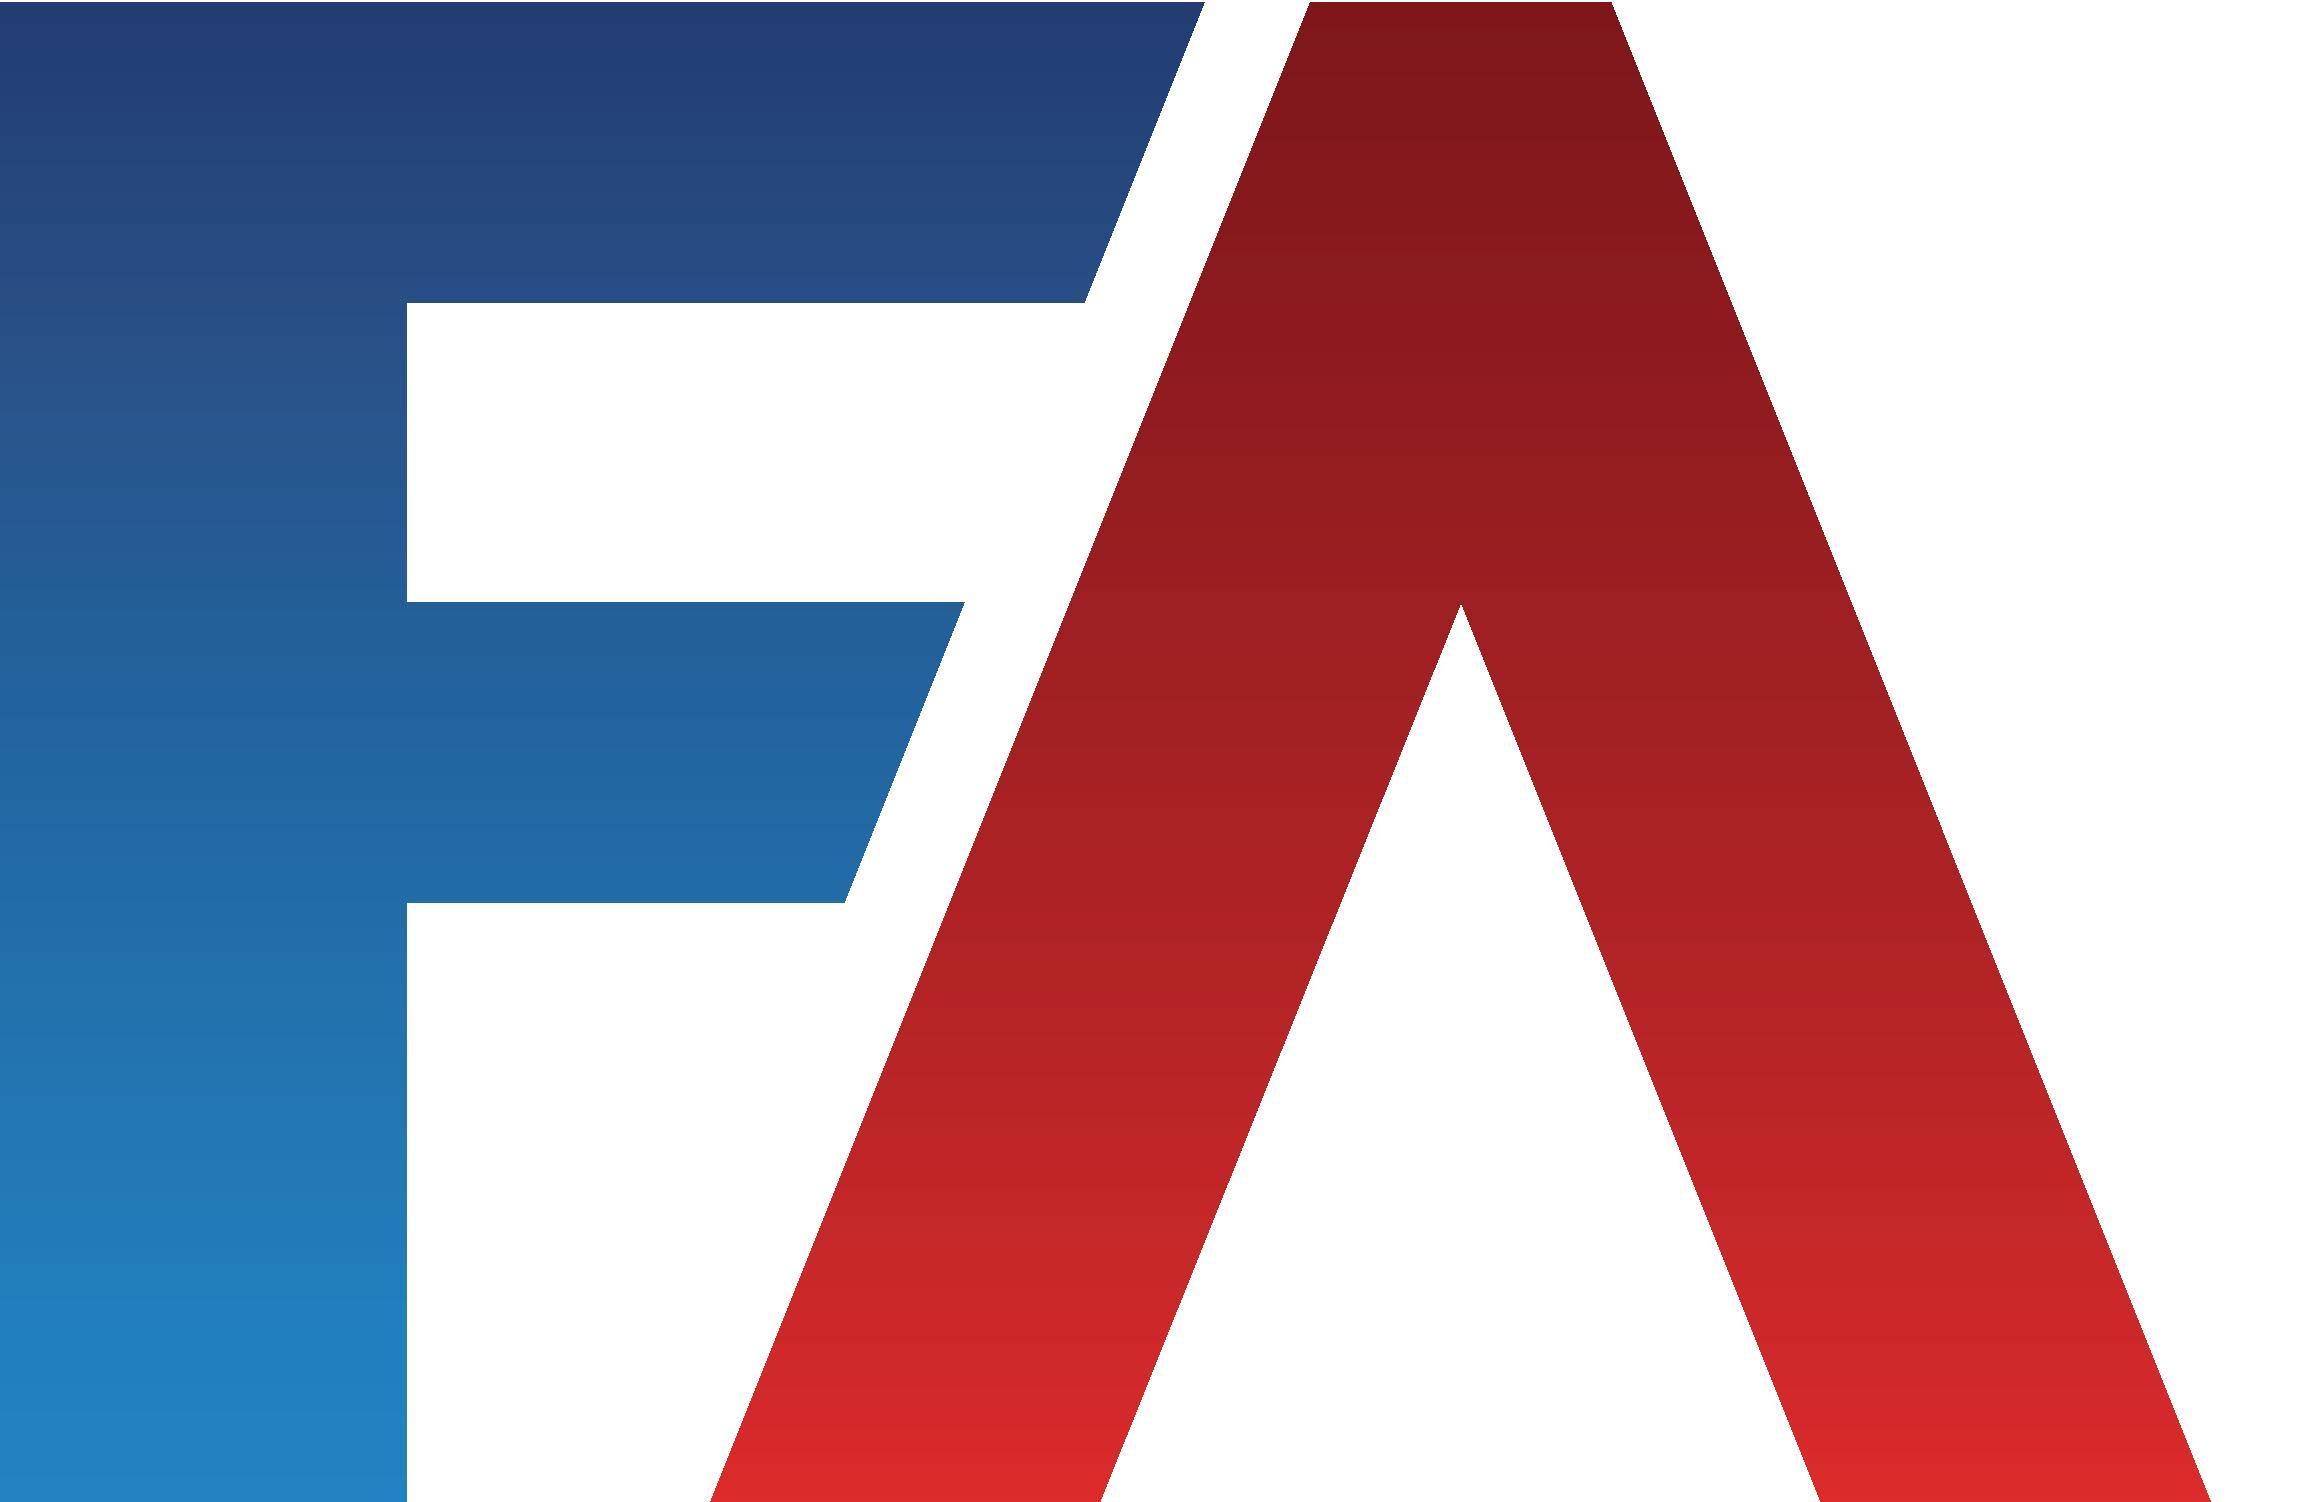 2015 NFL Coaching Changes: San Francisco 49ers | FantasyAlarm.com